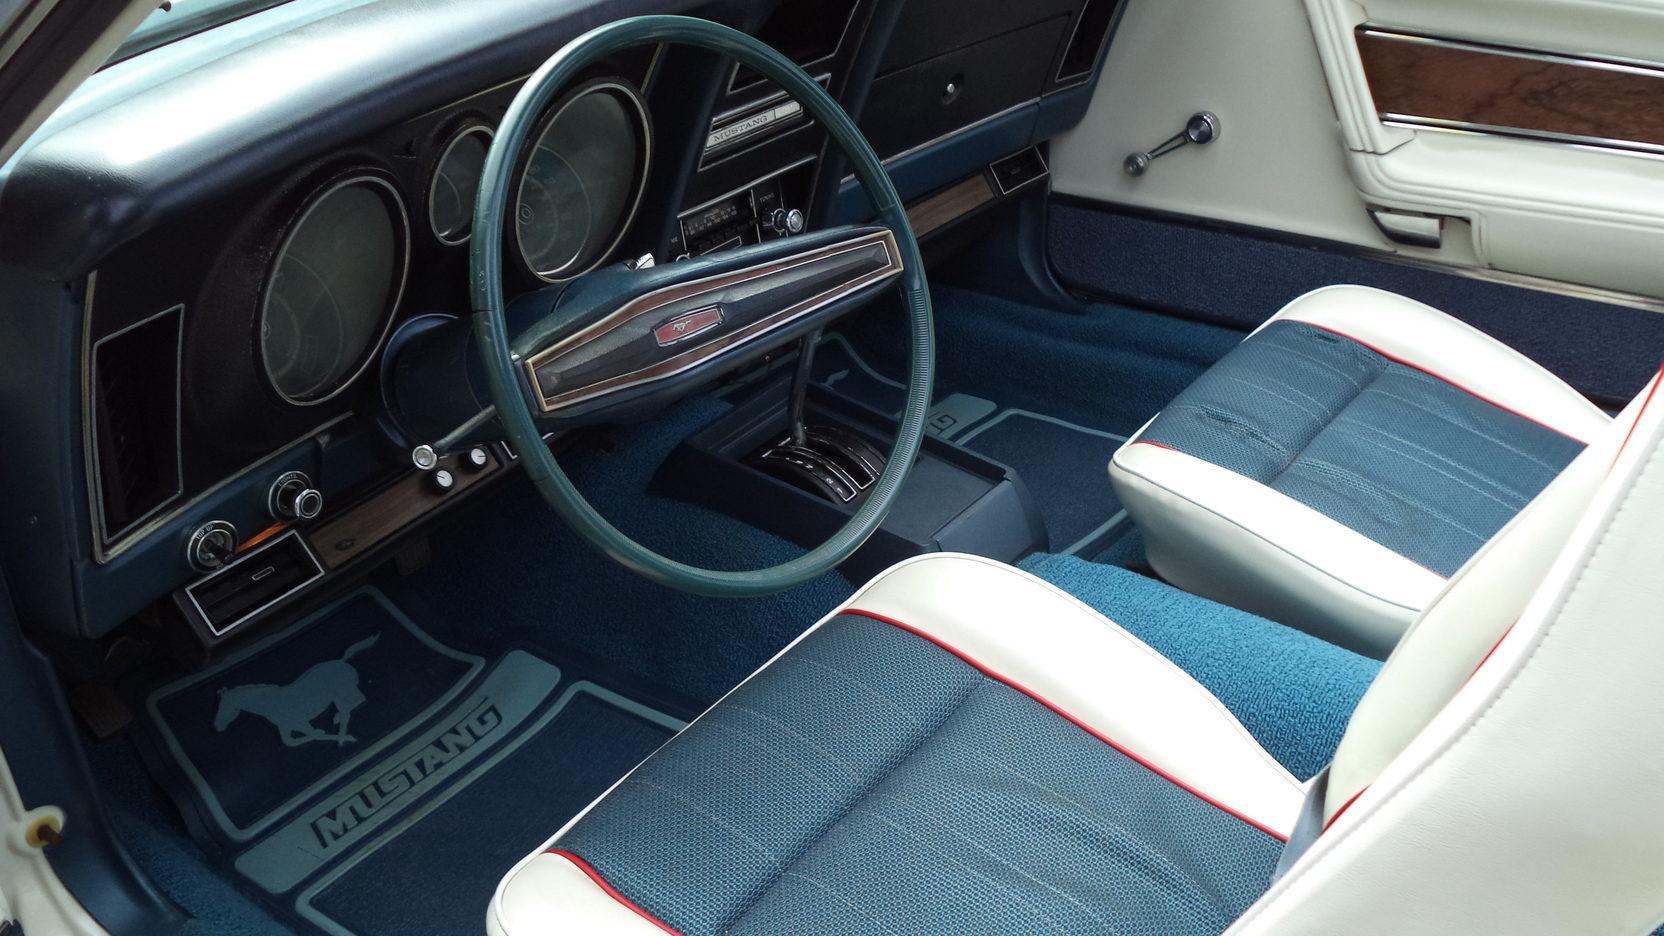 1972 Ford Mustang Sprint USA interior